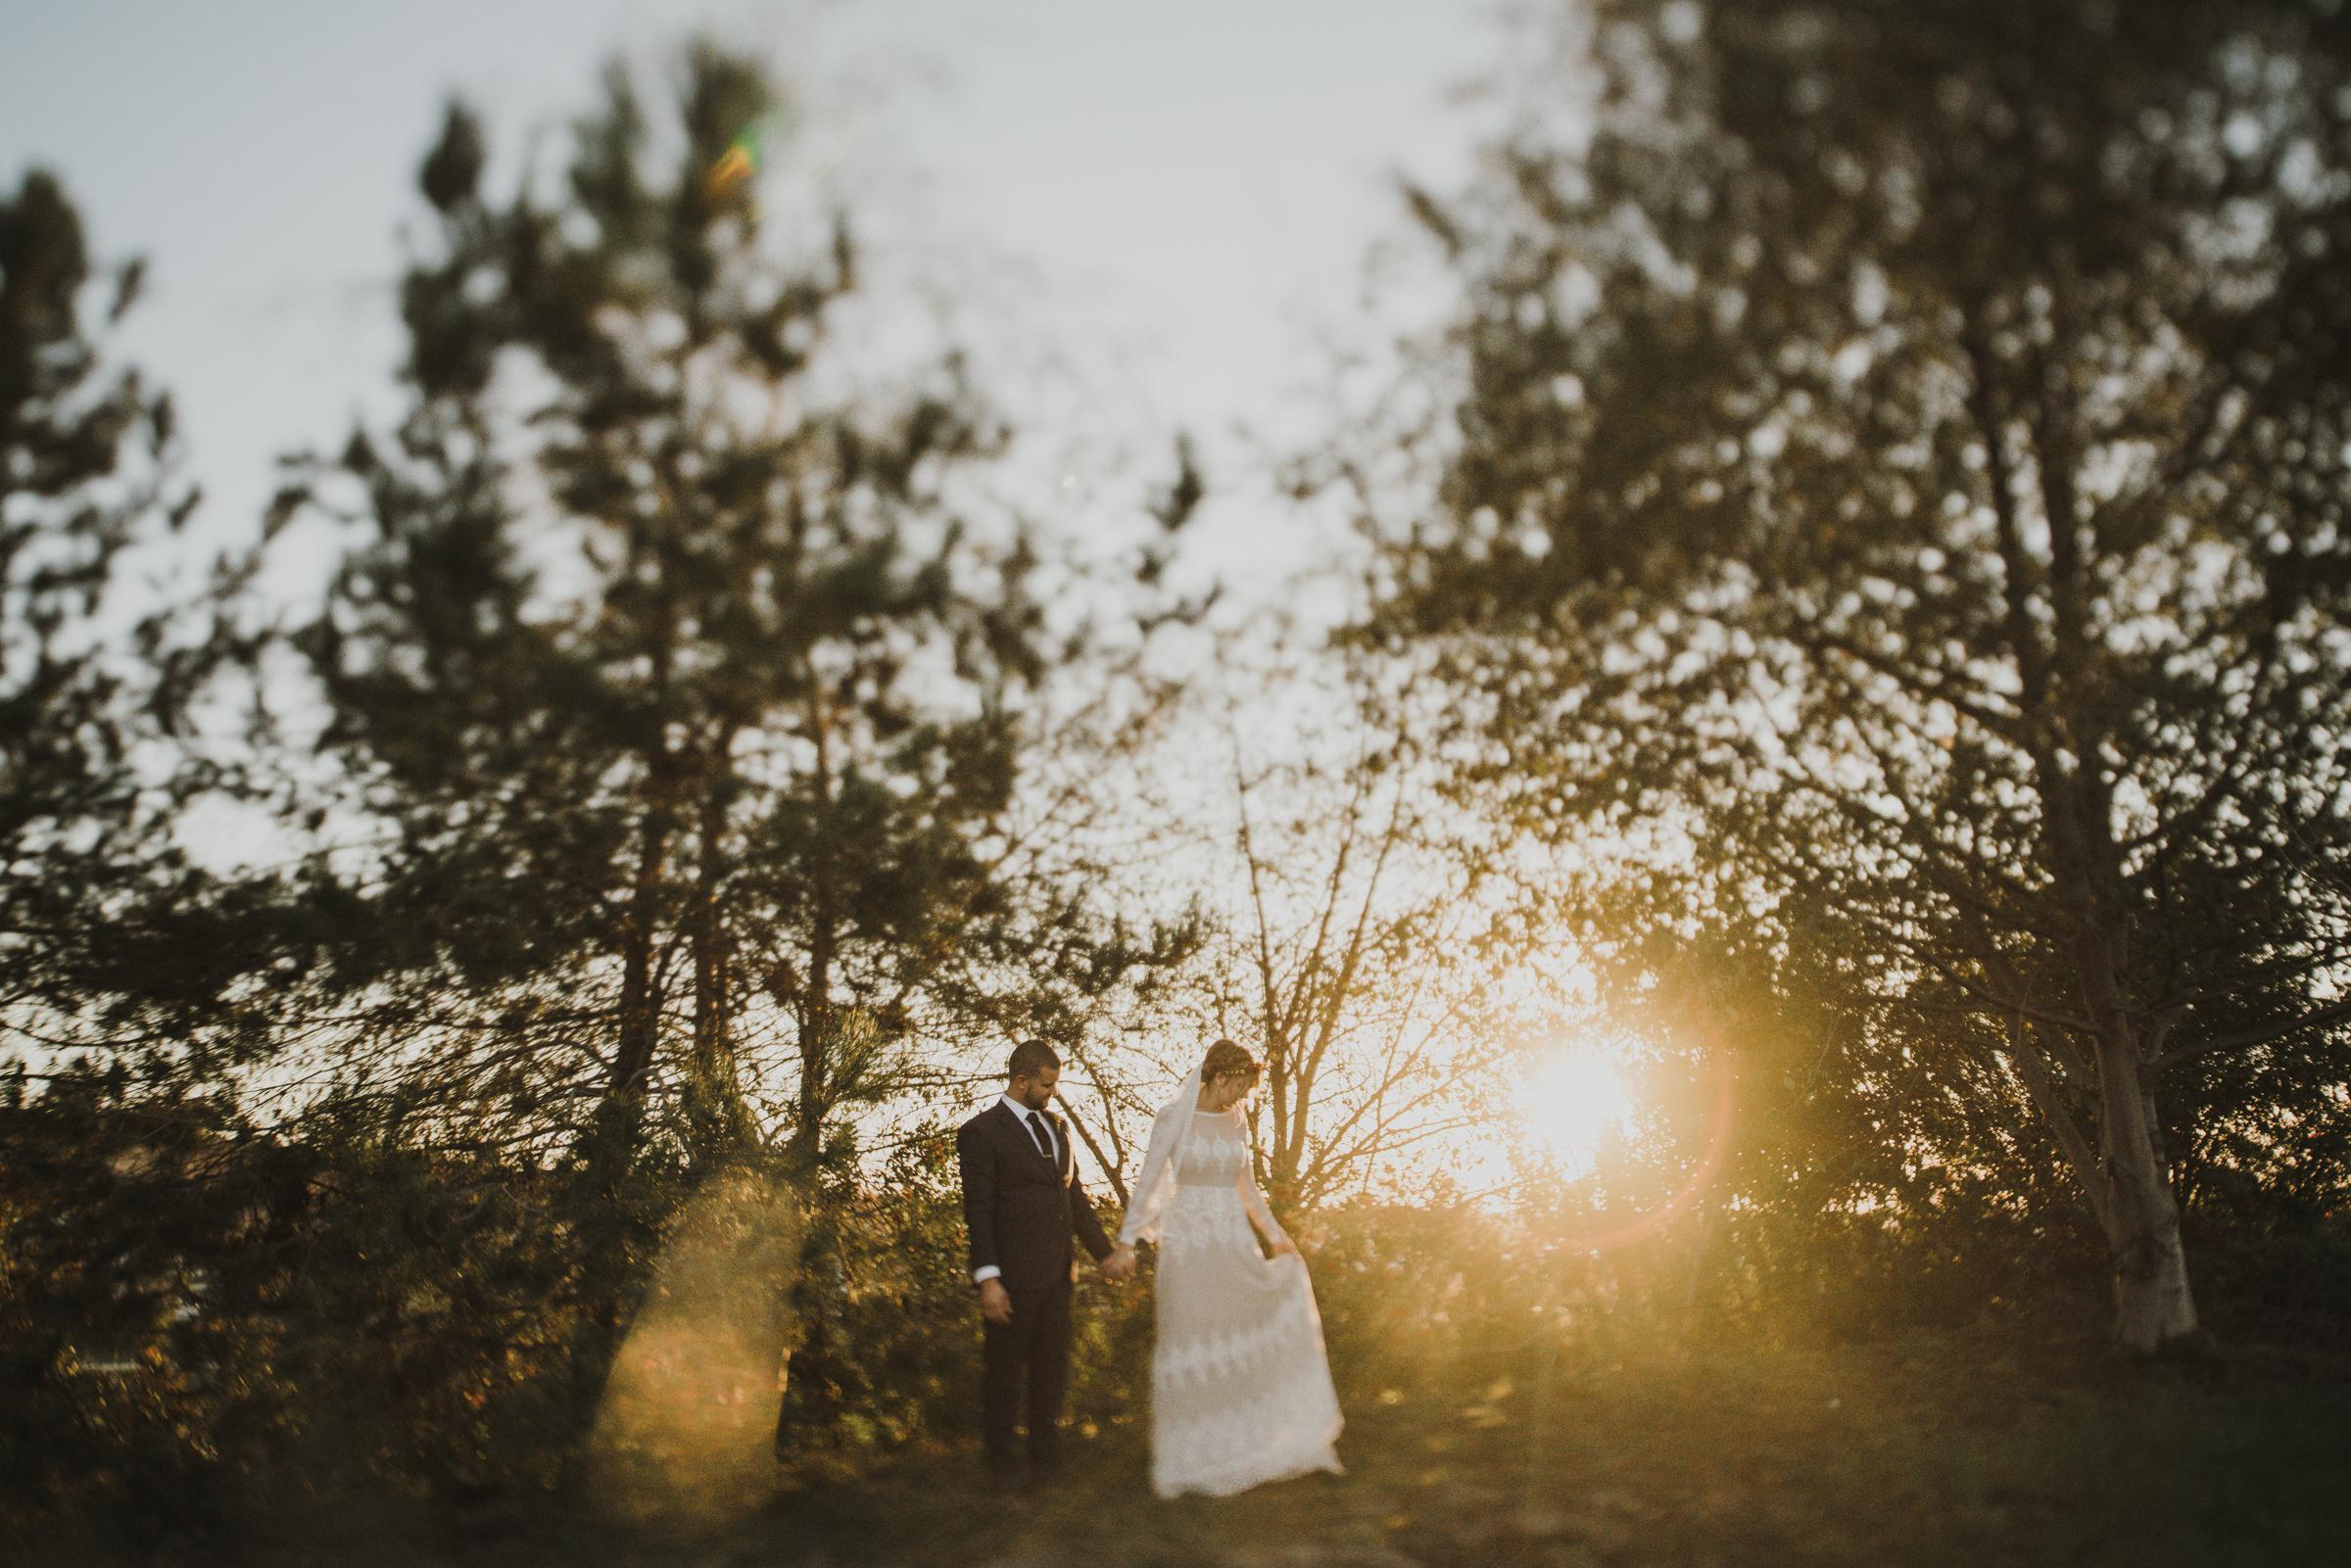 ©Isaiah + Taylor Photography - The Woodshed Booze Brothers Wedding, Vista California Wedding Photographer-97.jpg